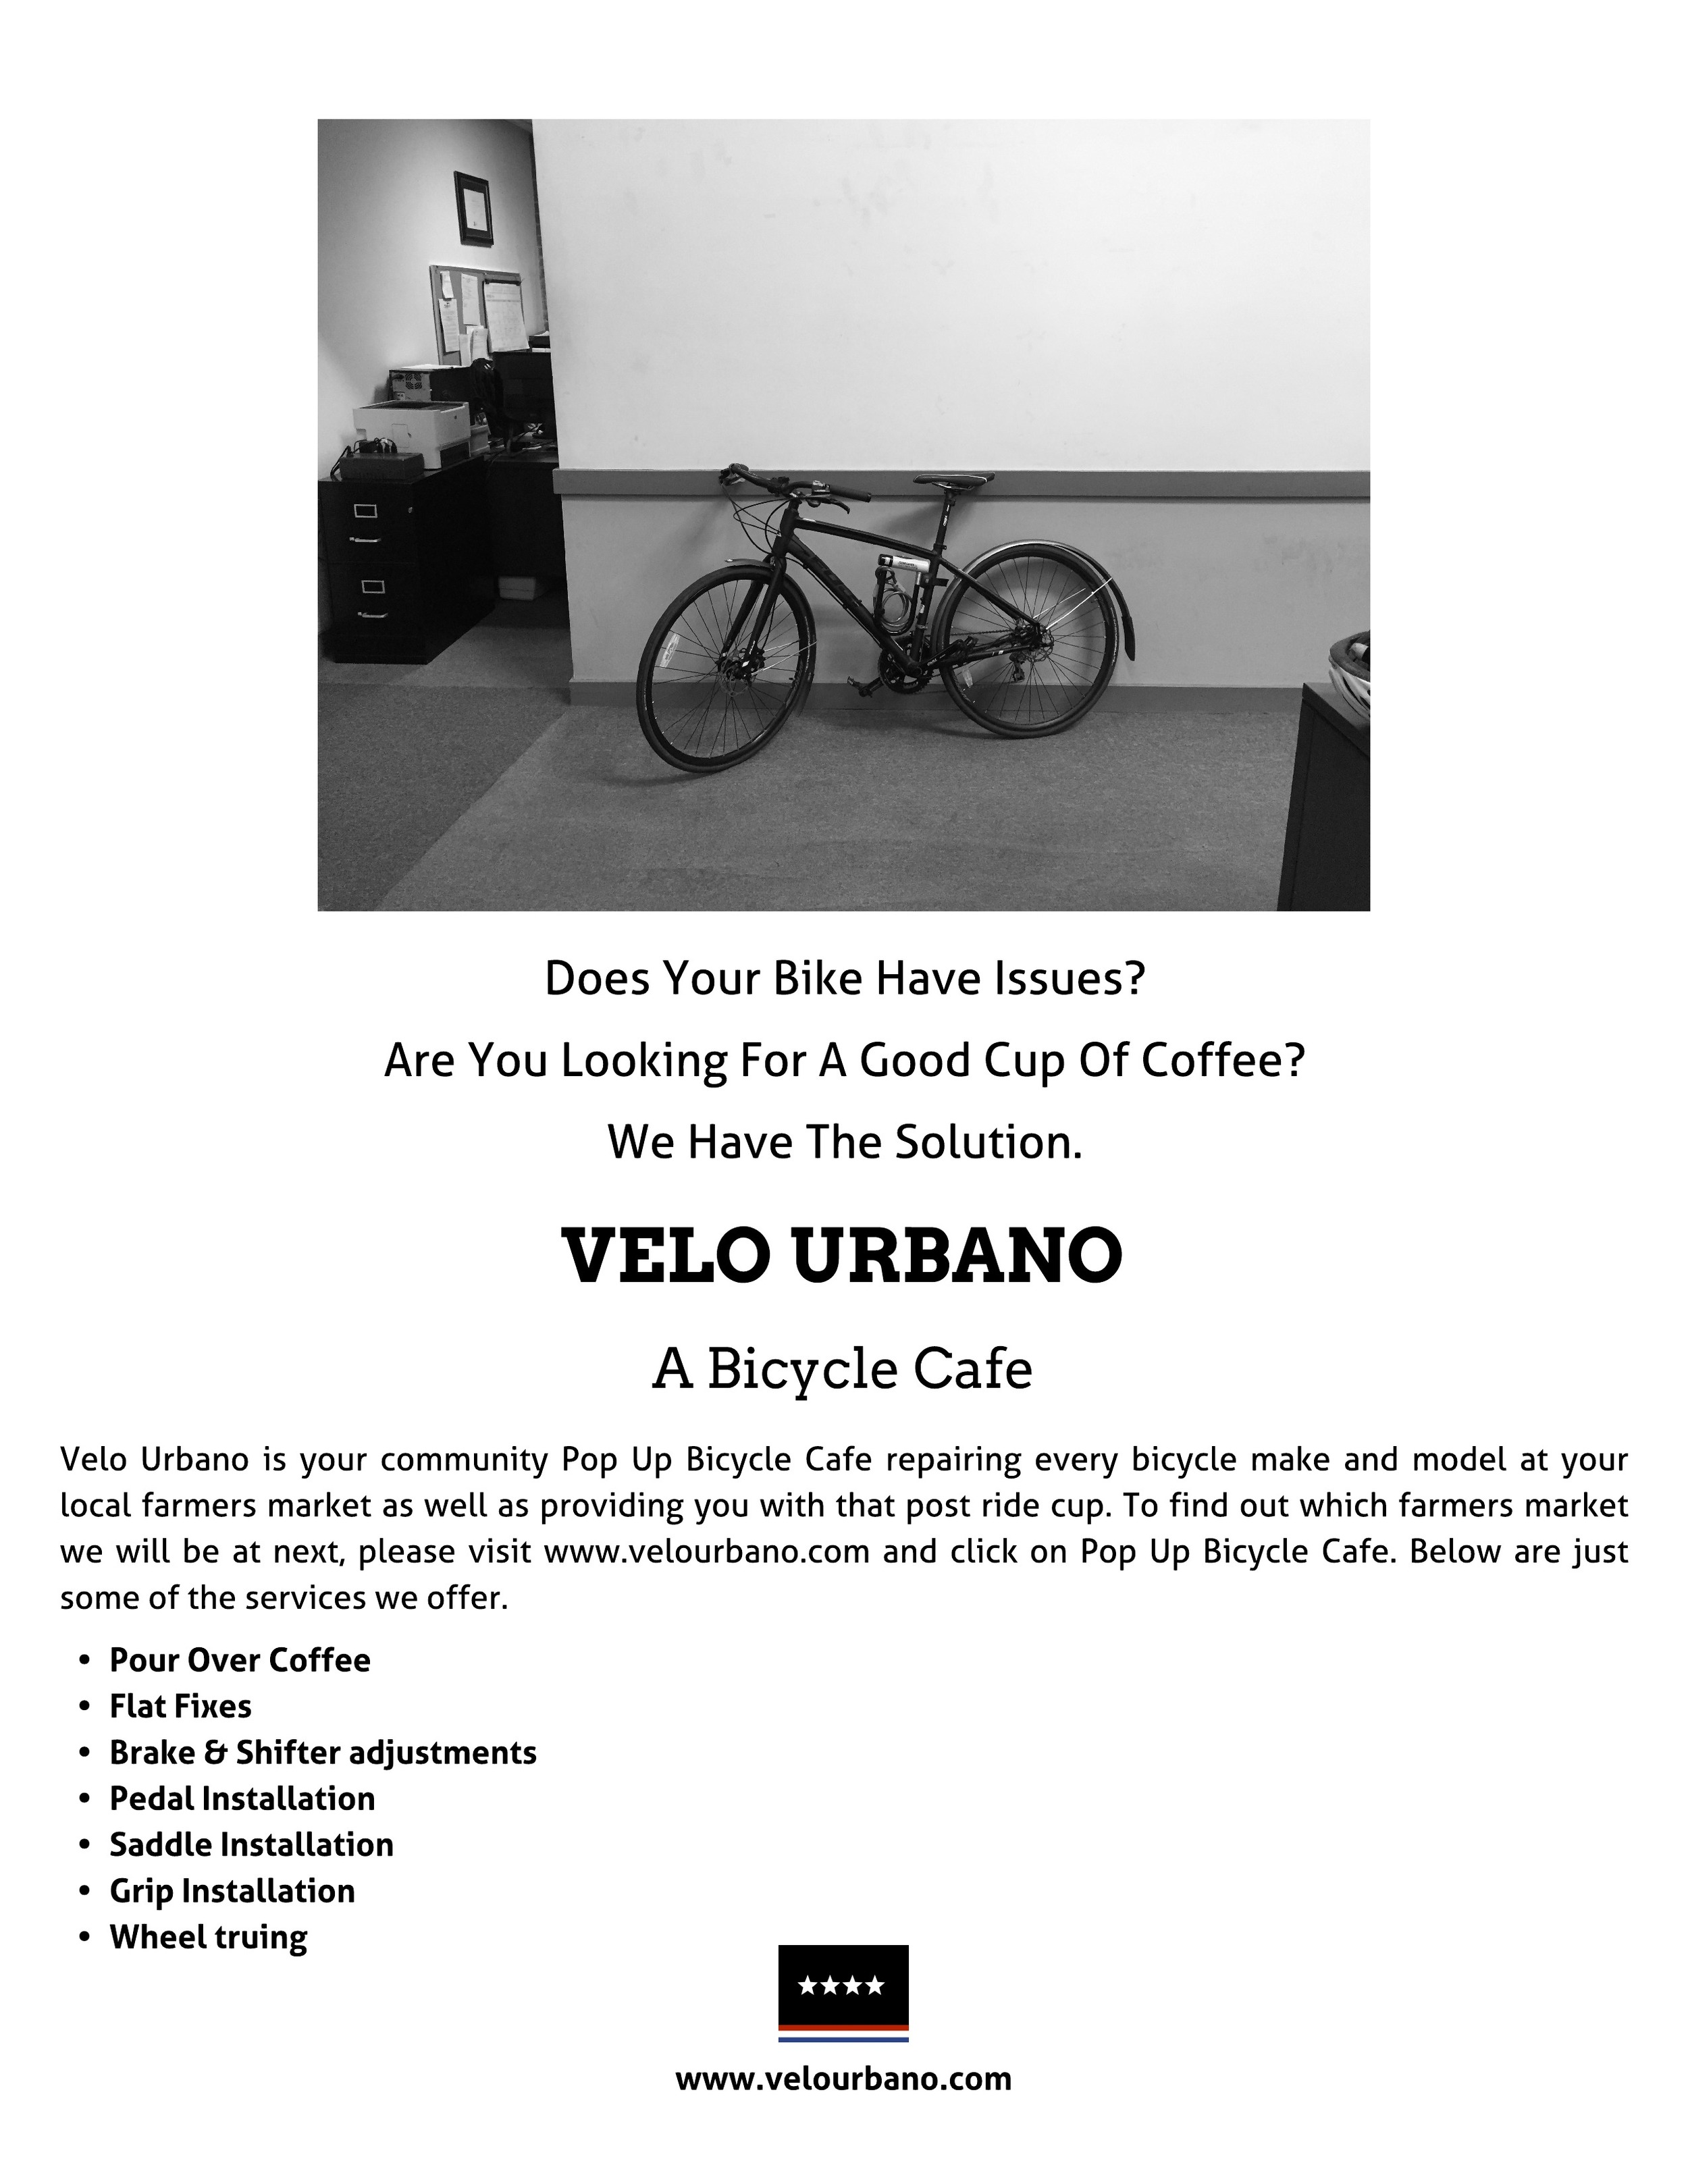 VeloUrbanoFlyer-W_BikeCafe.jpeg